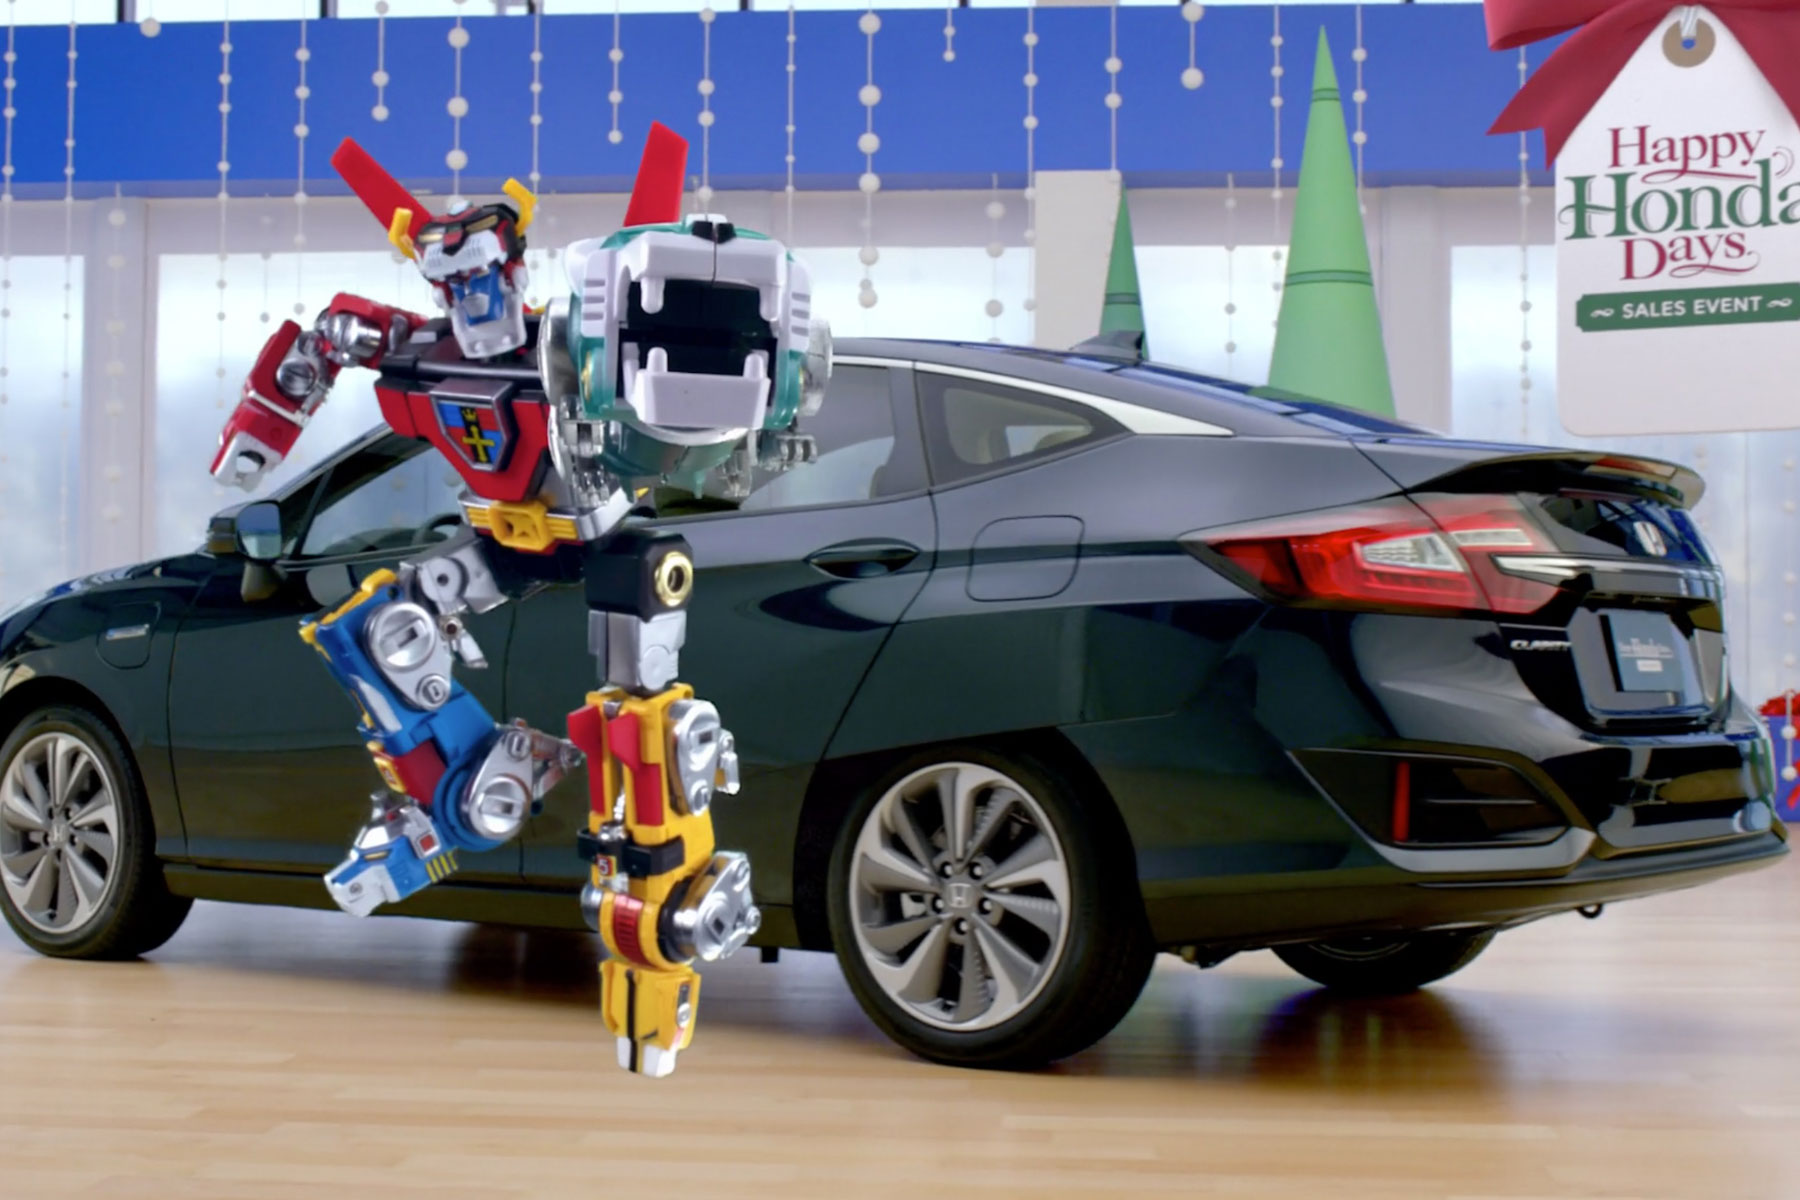 Honda Happy Days sales event